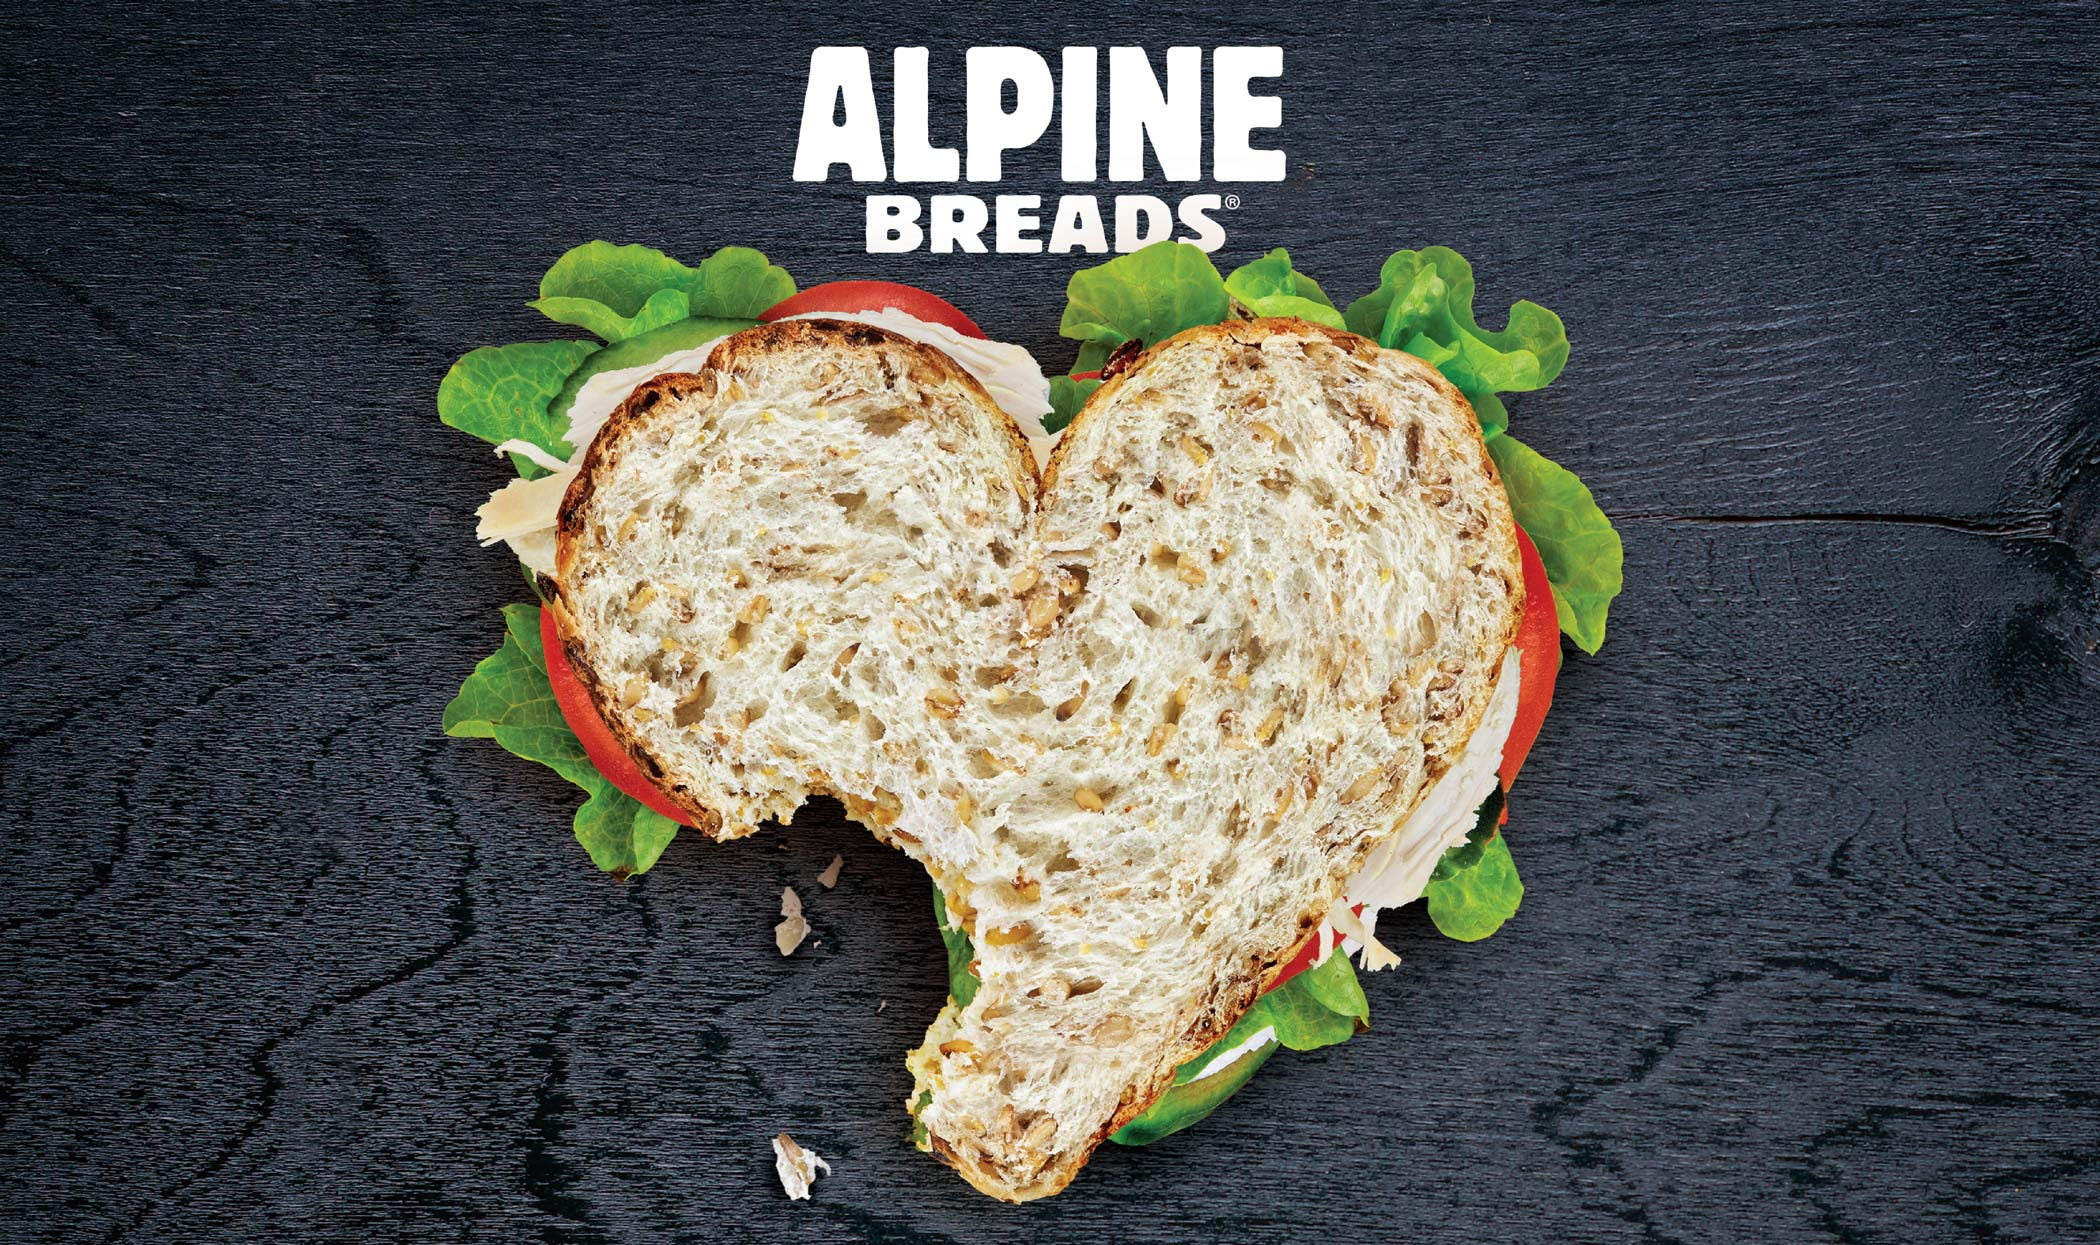 Alpine Bread Brand Identity